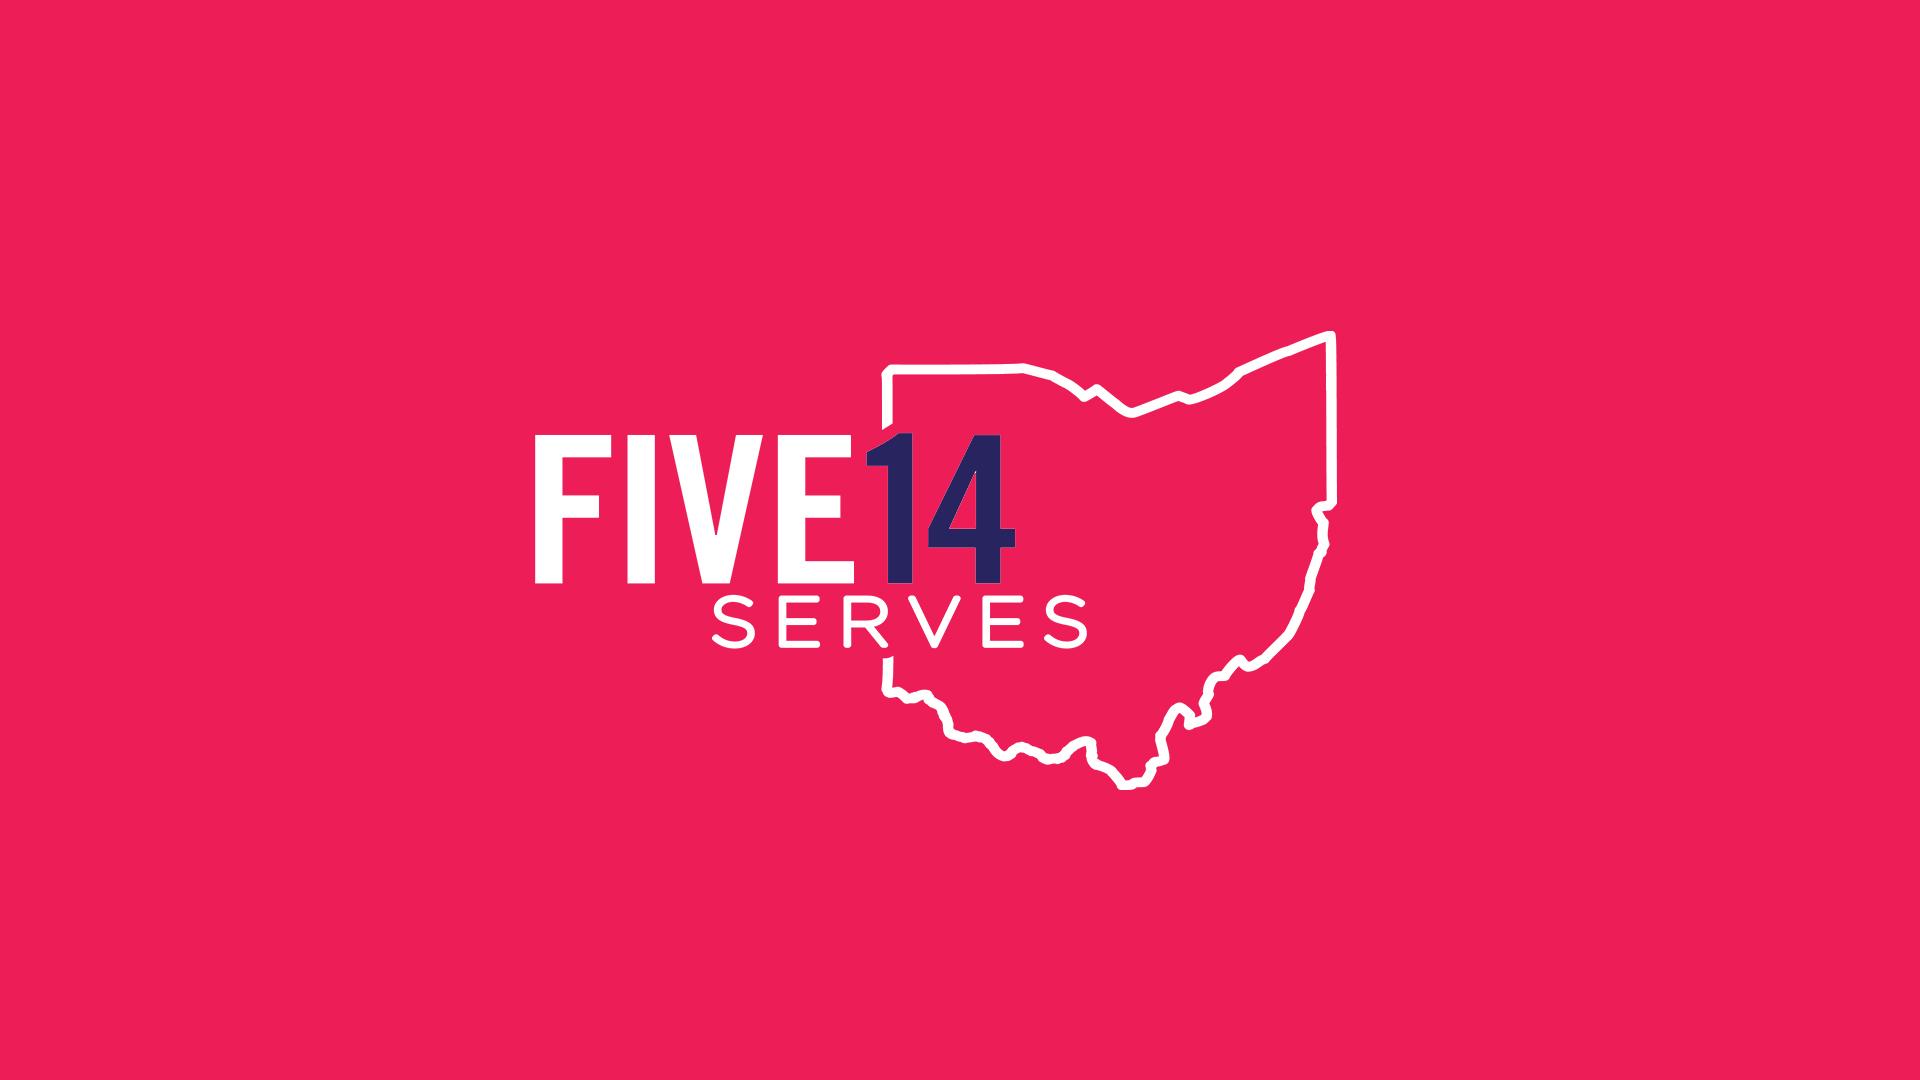 Five14 Serves